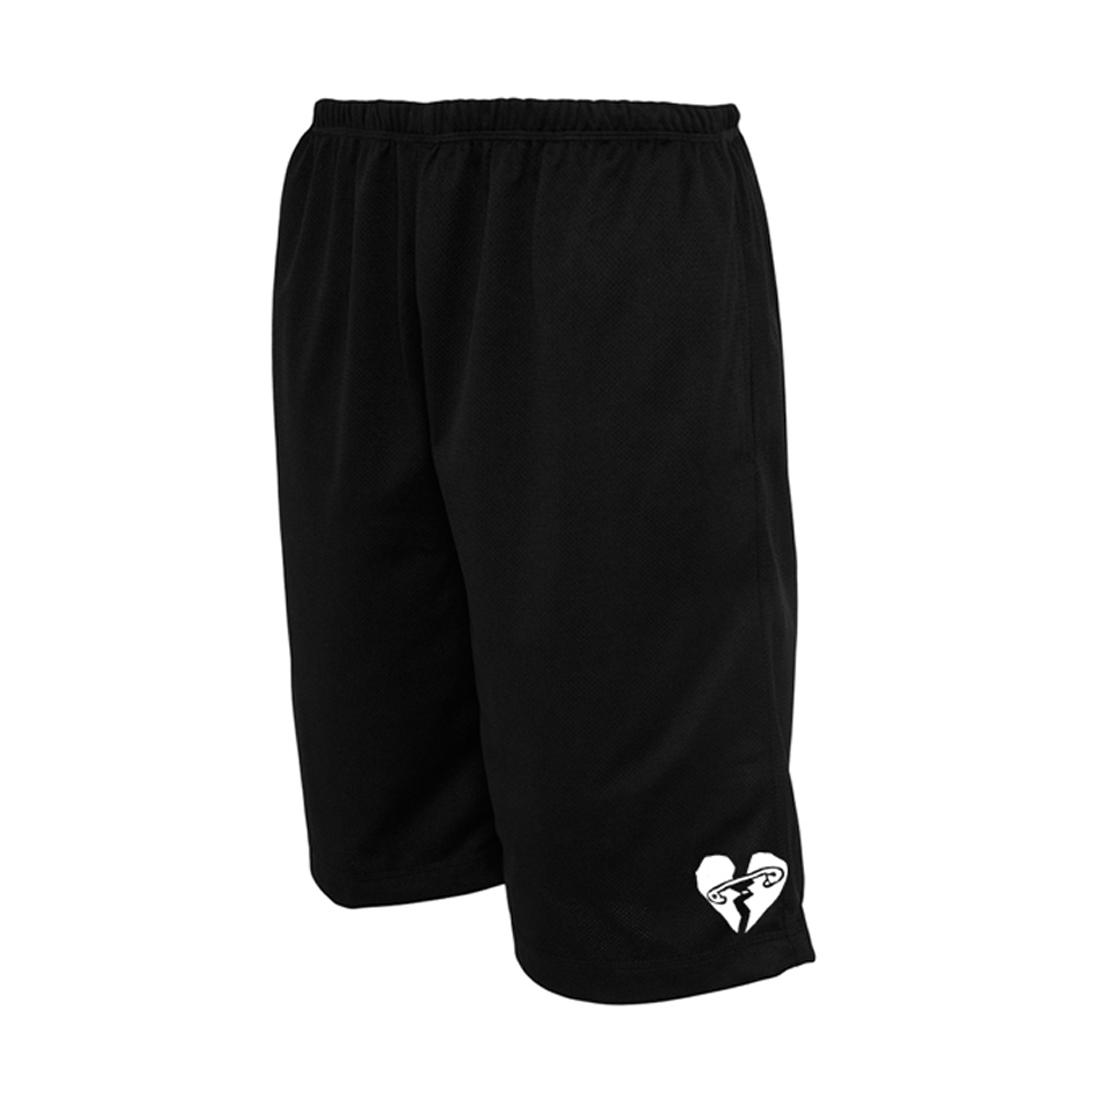 Safety Pin Baller Shorts